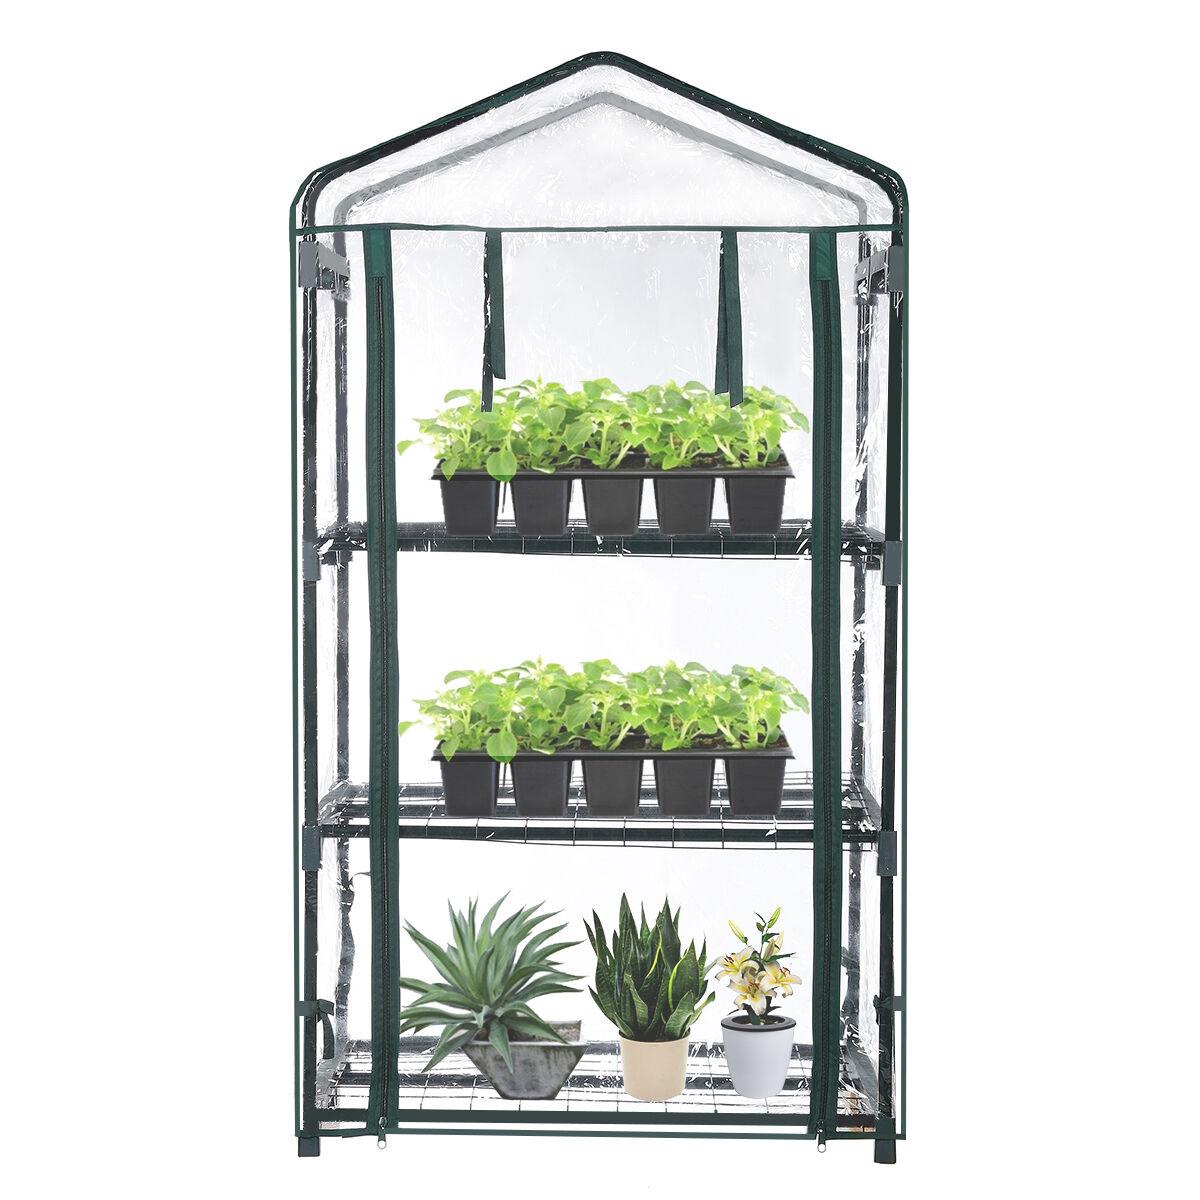 tooca Audew Mini Greenhouse 3-Tier Portable Plant Greenhouse For Indoor and Outdoor Gardens/Patios/Backyards